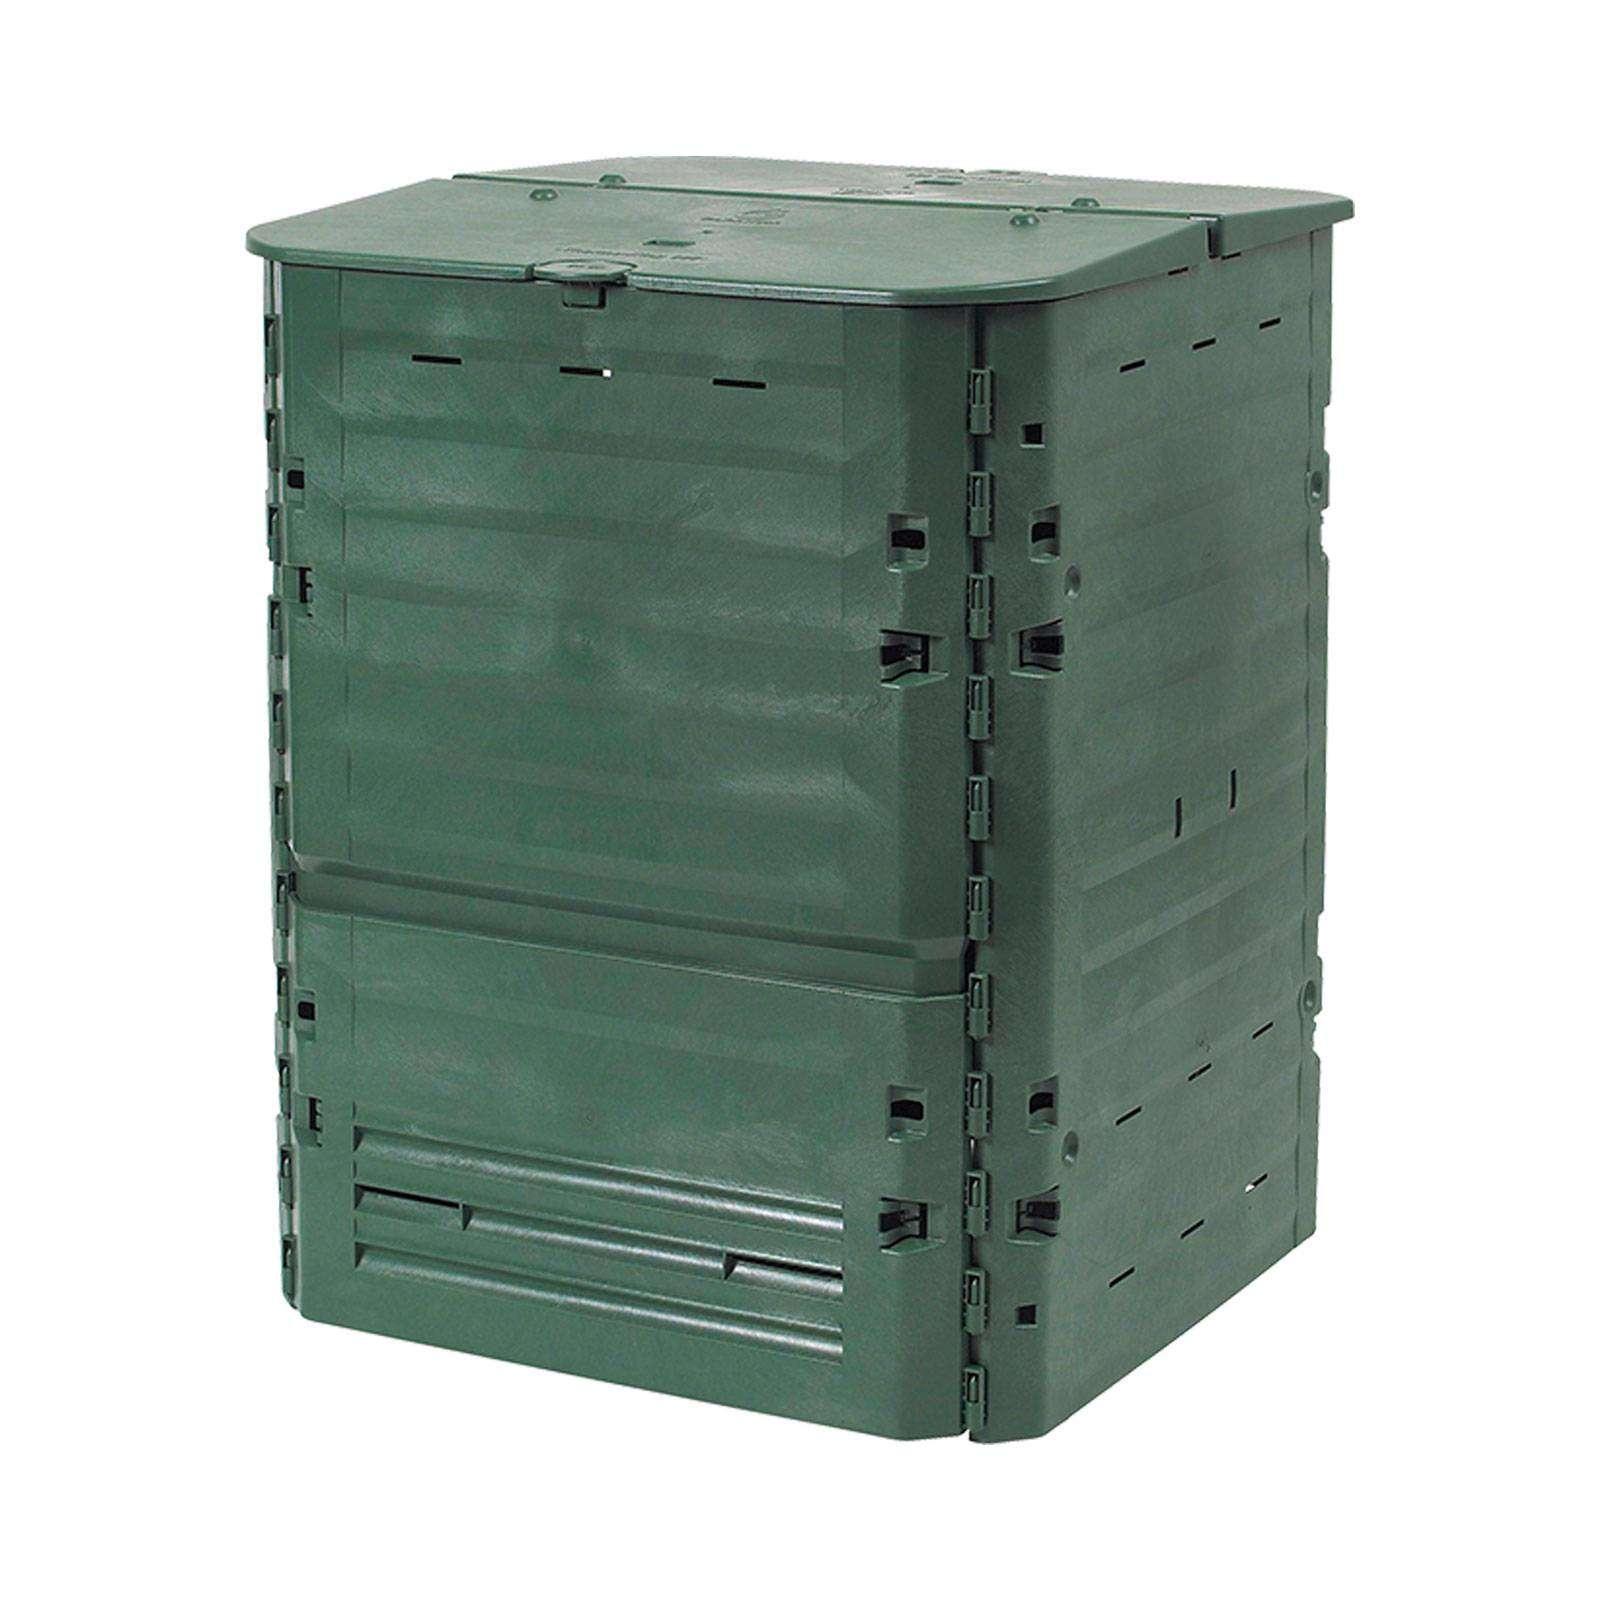 compostador thermo king graf 600 litros en cocopot huerto y jardin. Black Bedroom Furniture Sets. Home Design Ideas